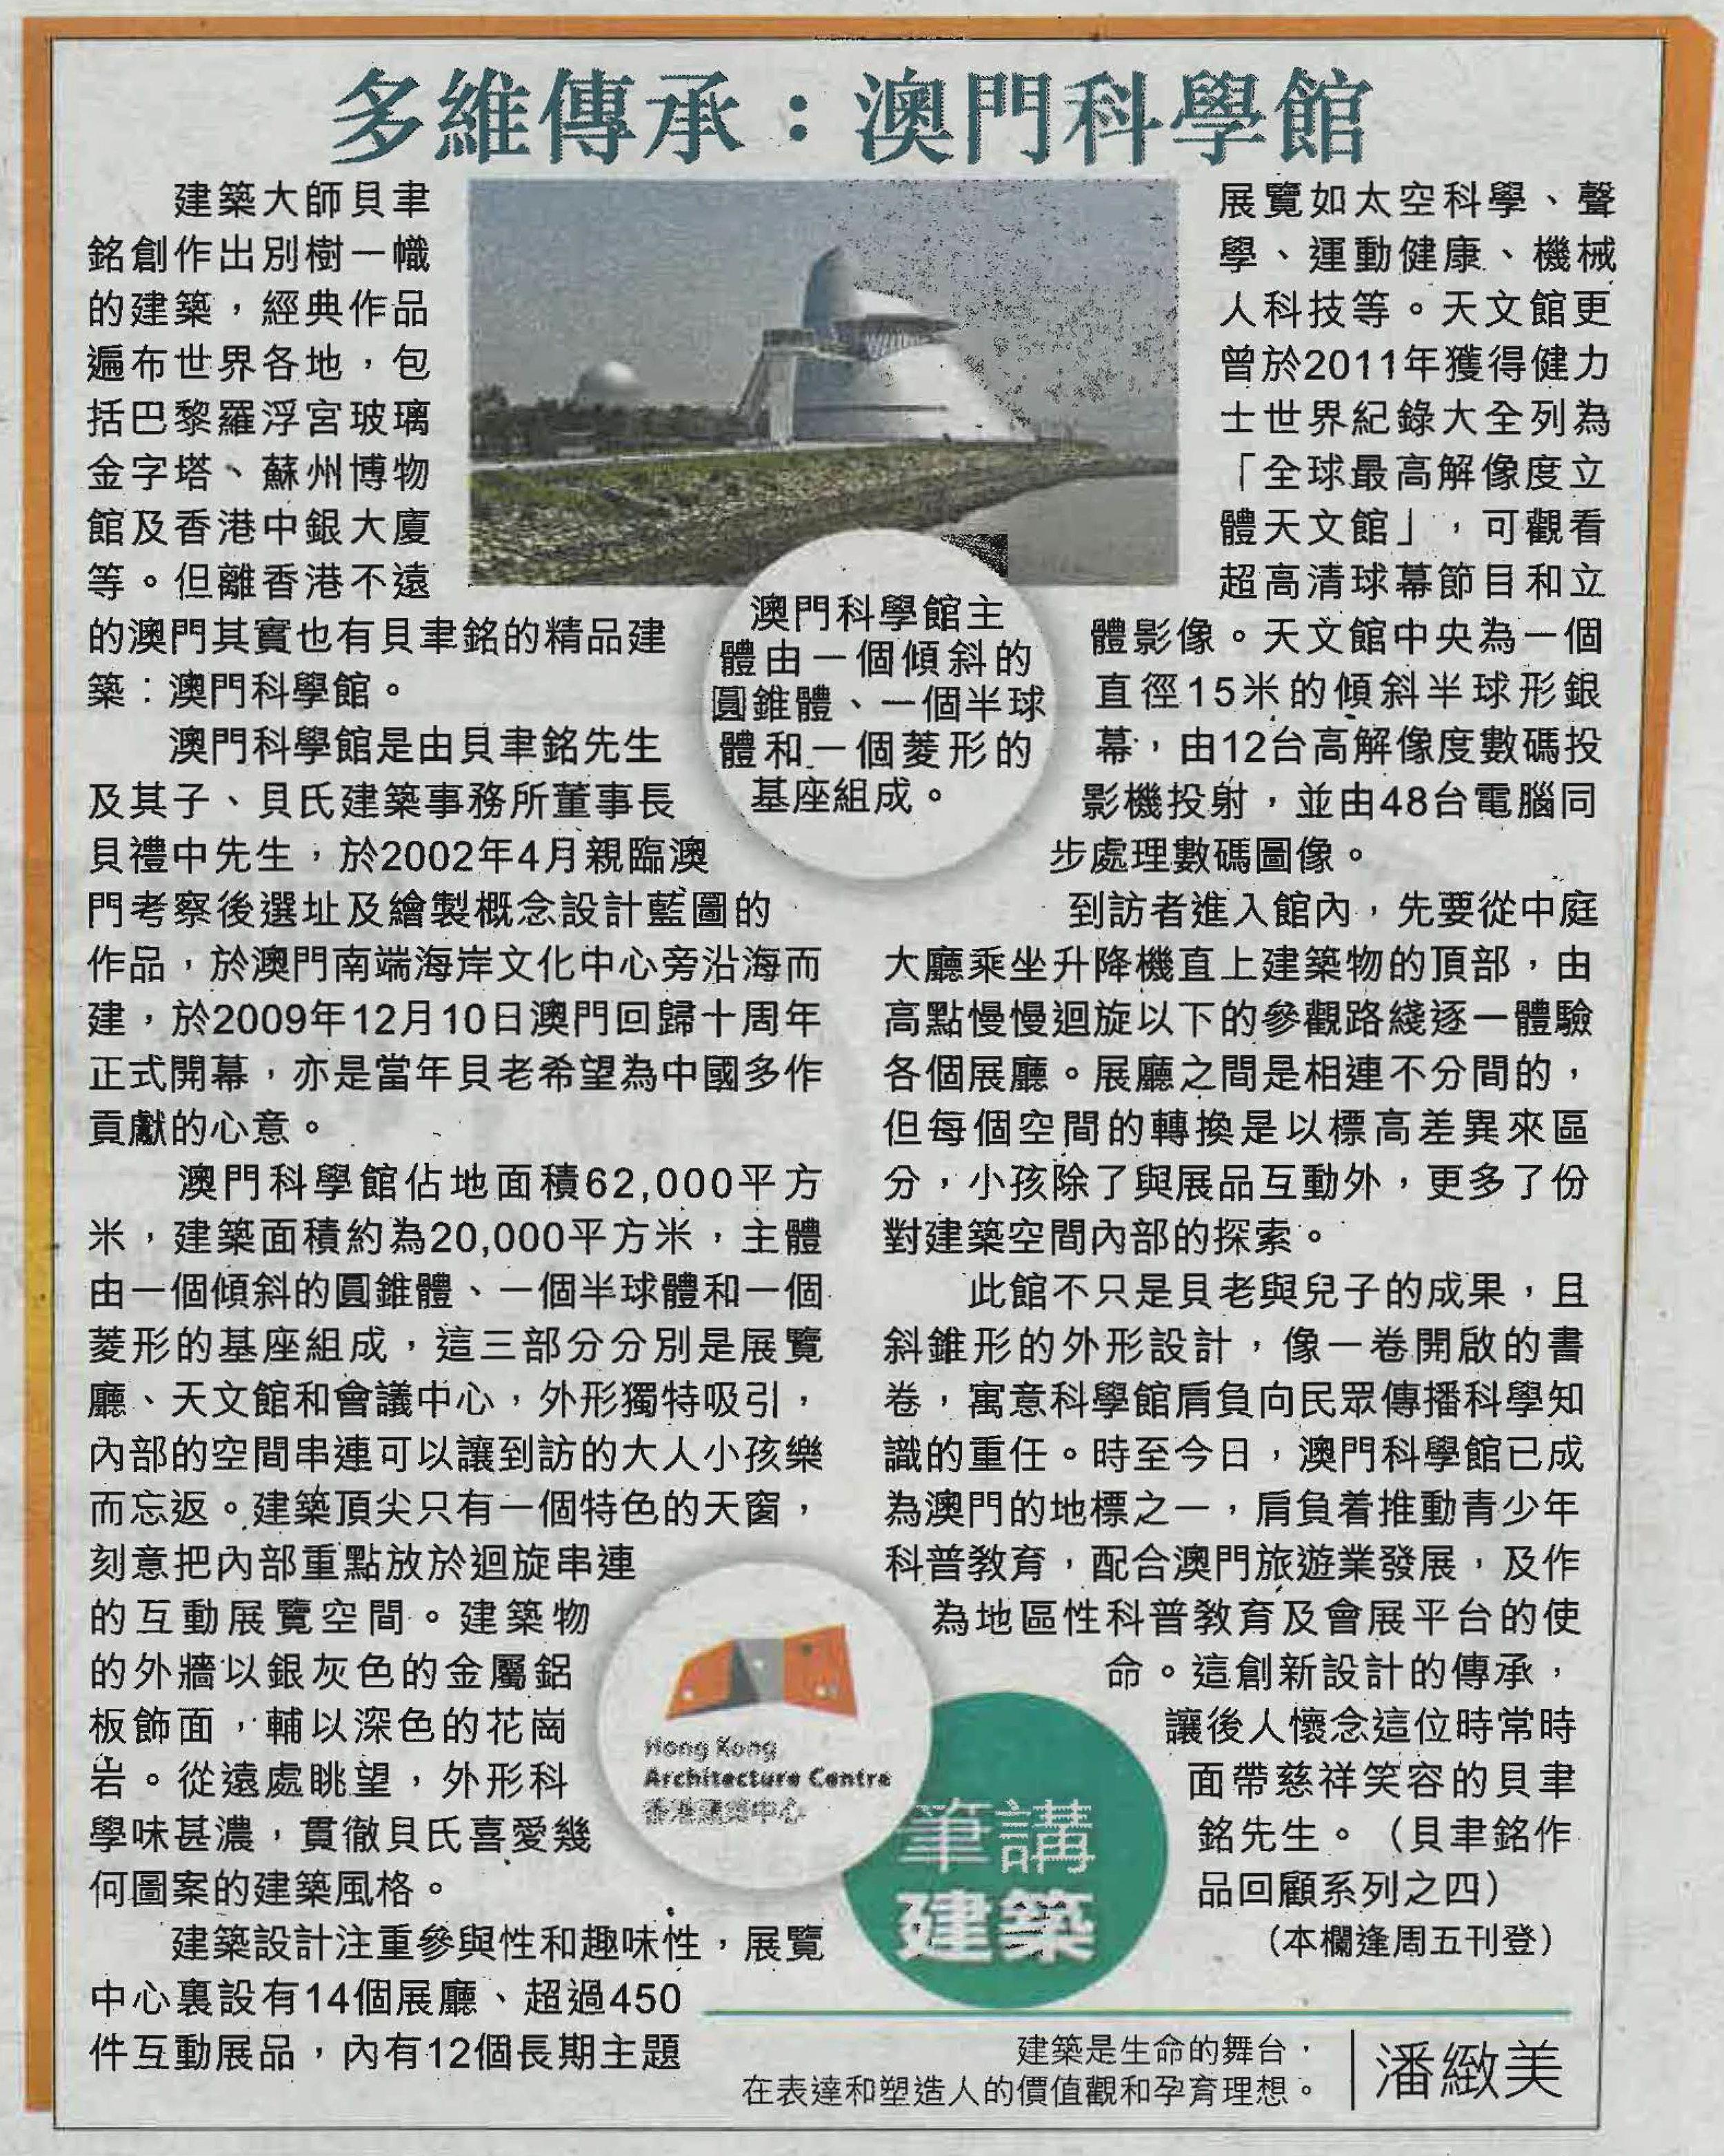 Skypost_190809_潘緻美_多維傳承 澳門科學館_Resize.jpg